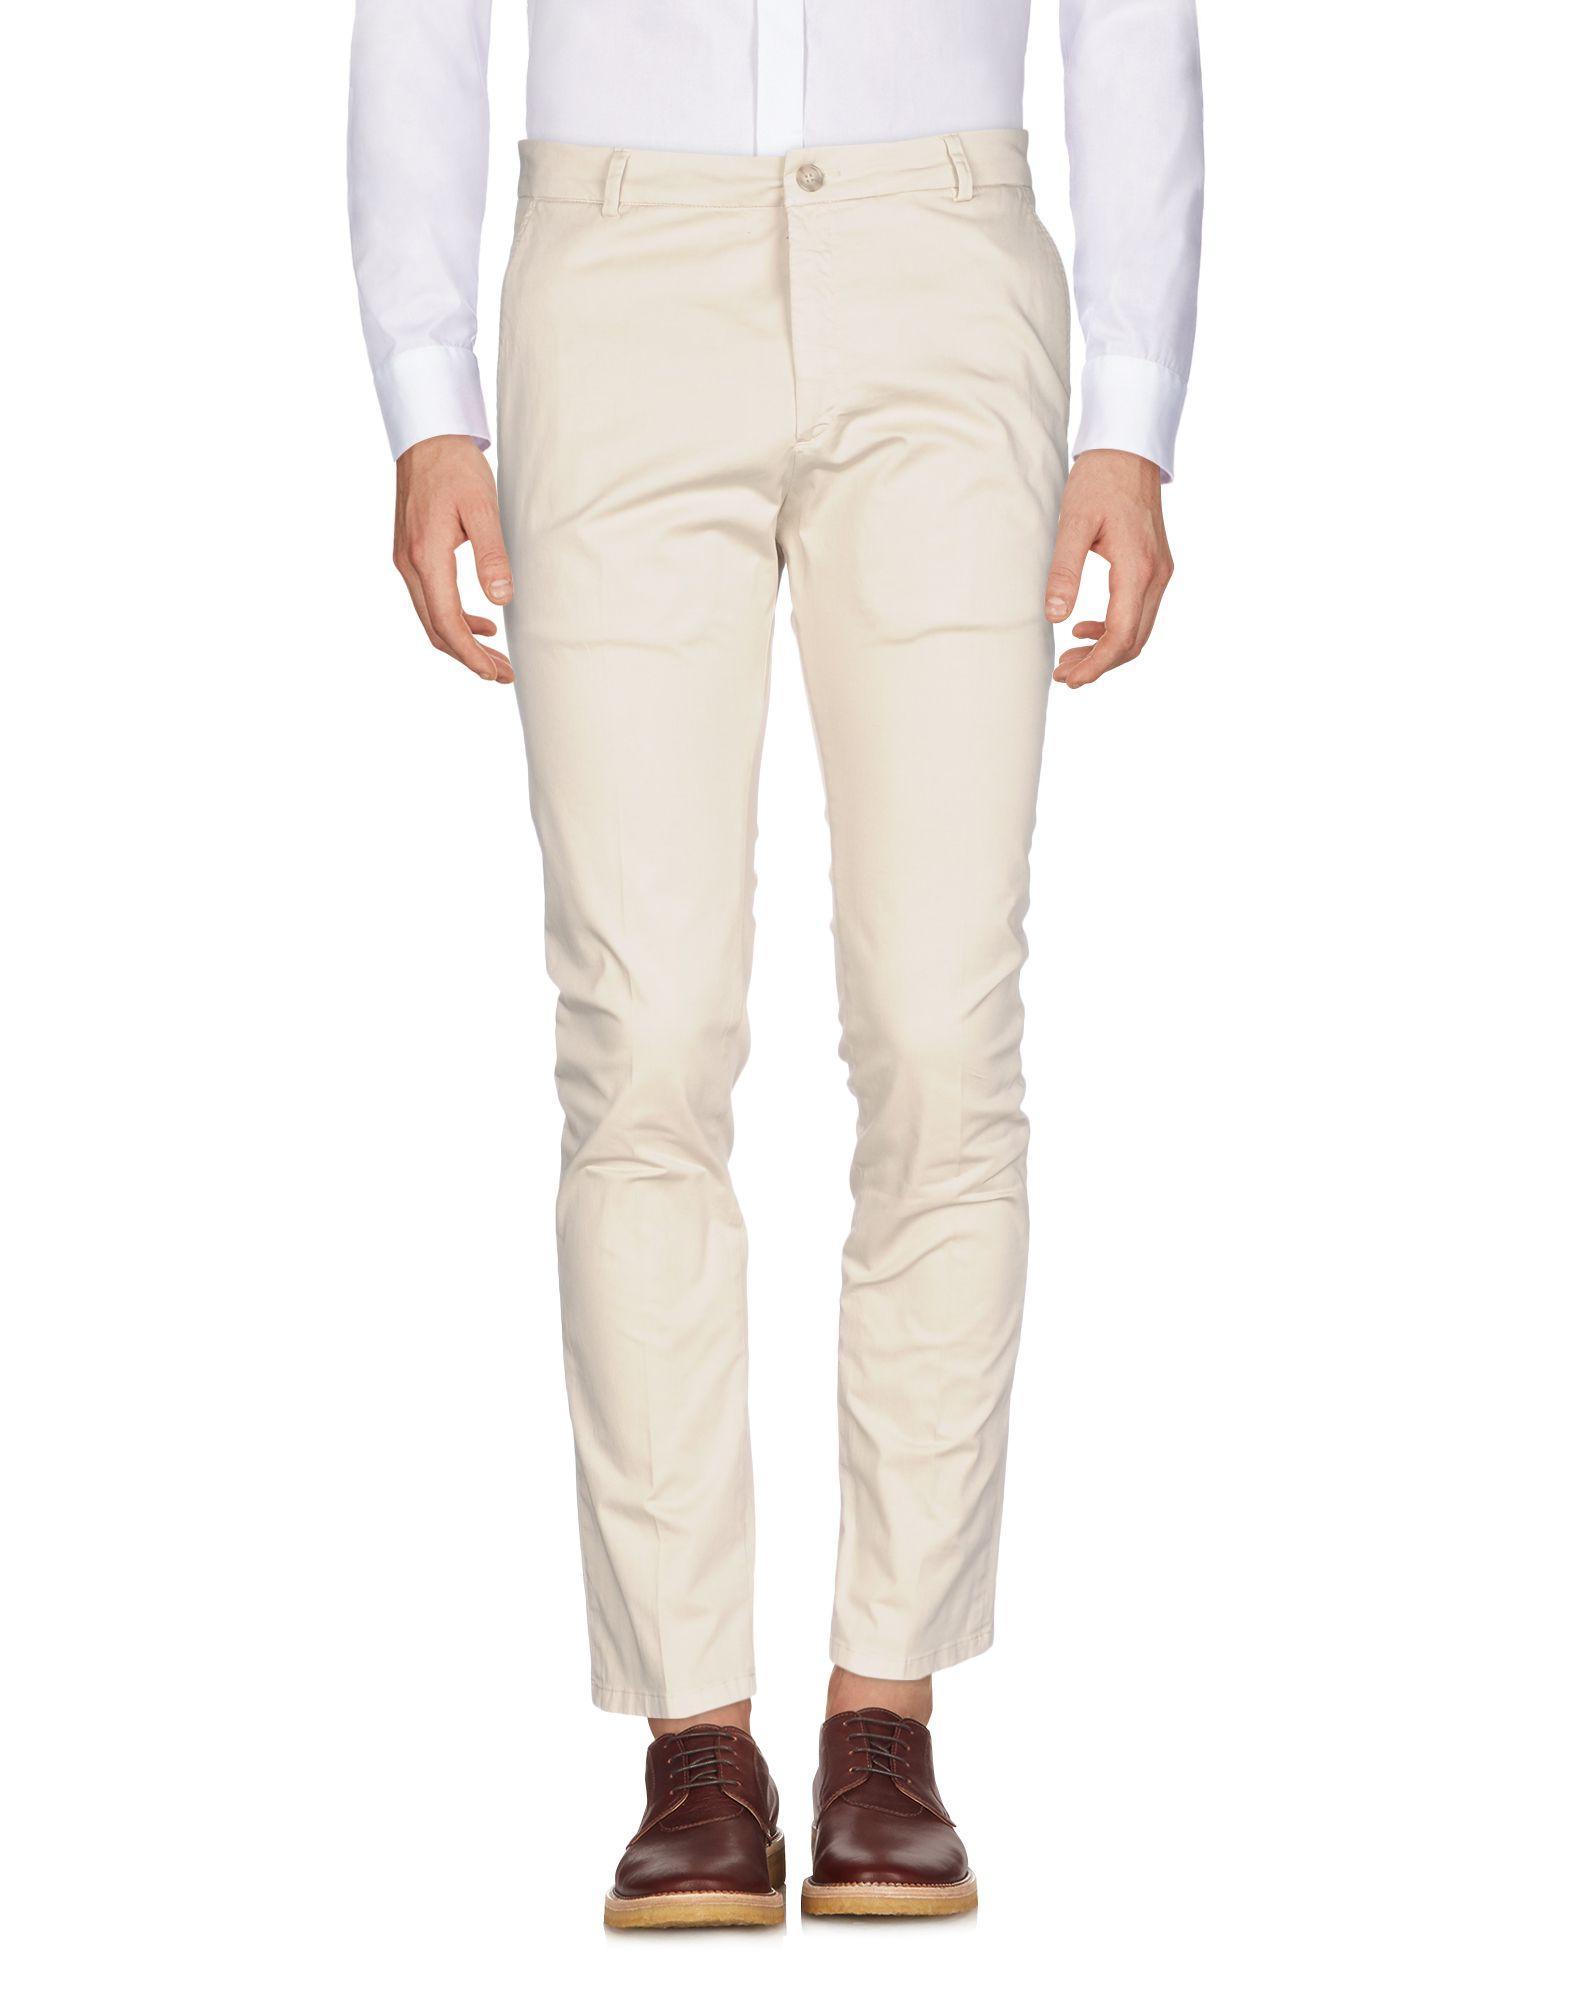 Low Brand Casual Pants In Beige